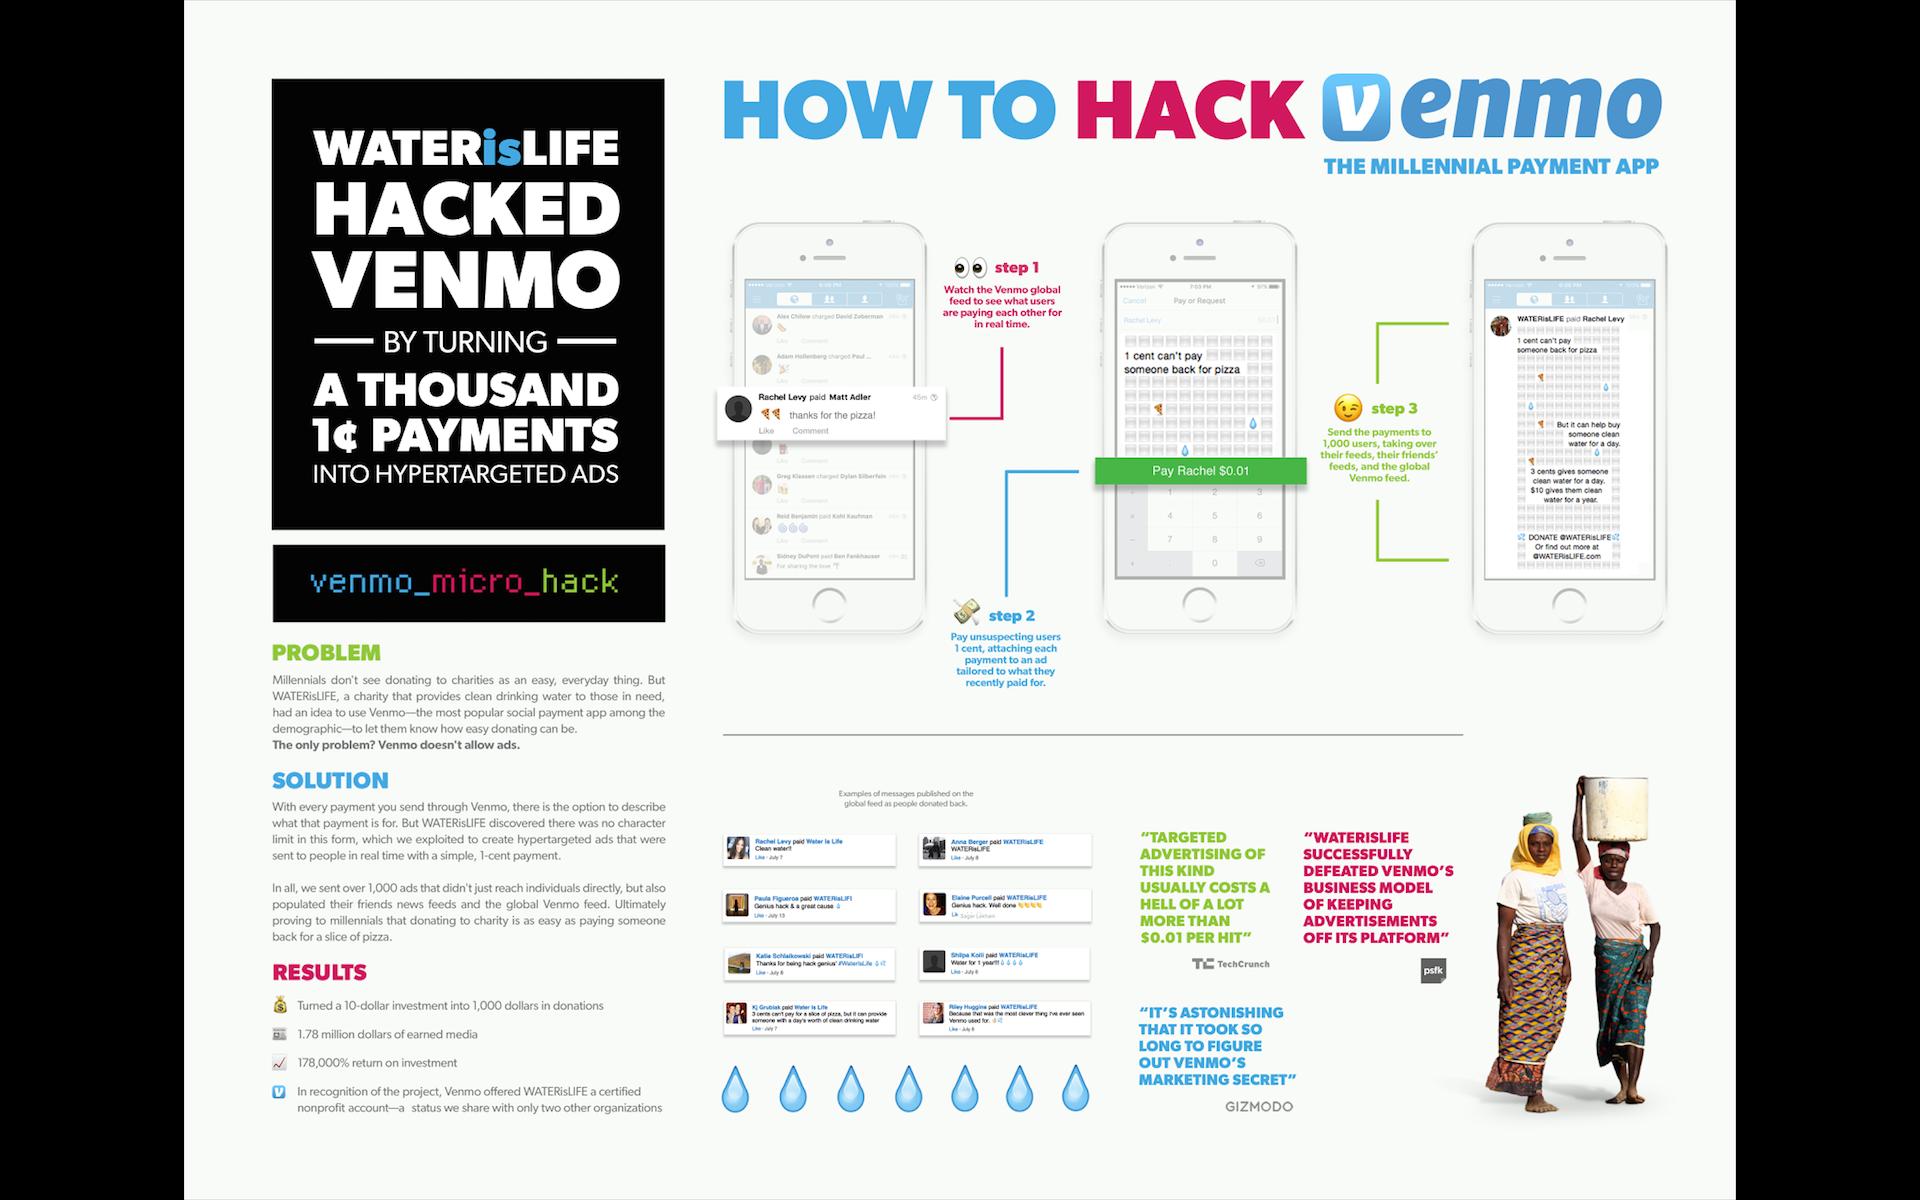 Venmo Micro Hack - The Shorty Awards